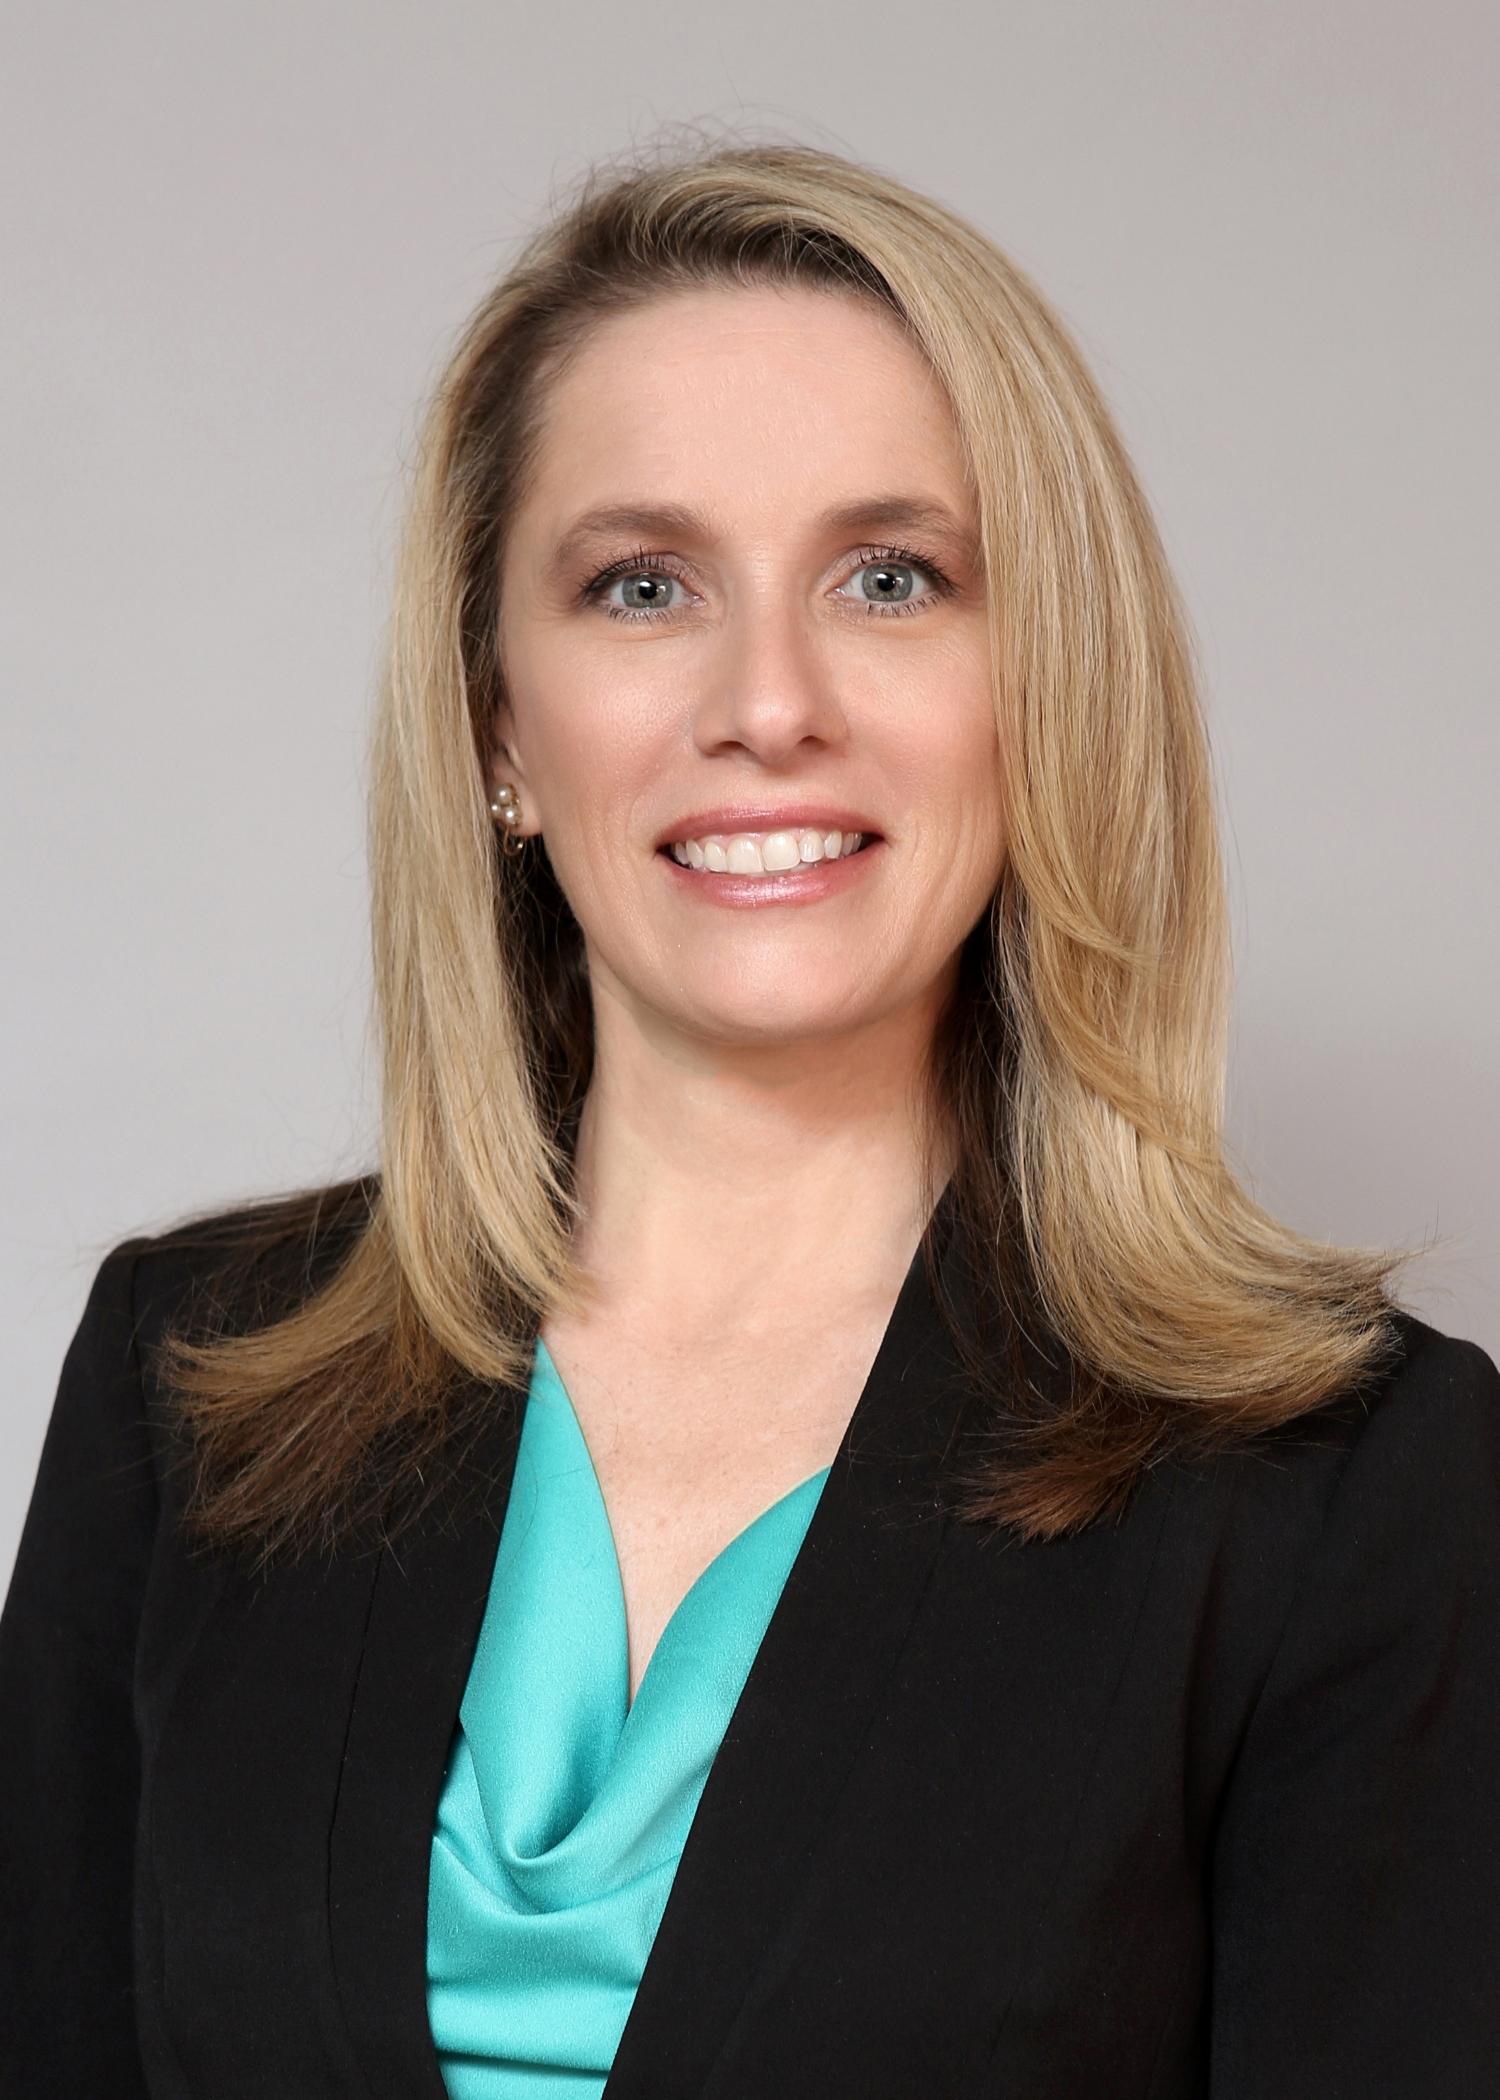 Kelly O'Keefe